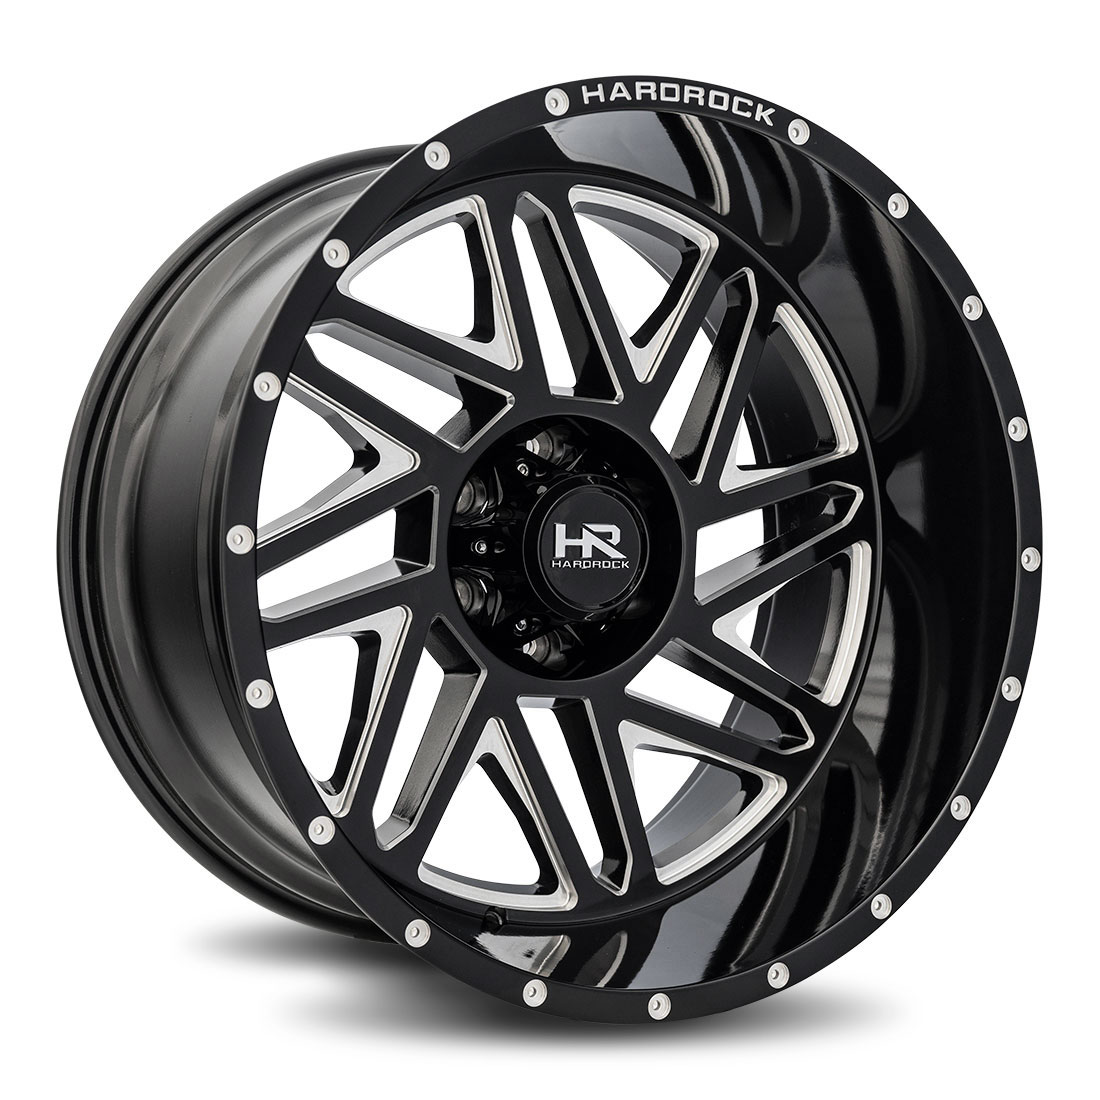 Hardrock Offroad Wheels H501 Bones-Xposed - Gloss Black Milled - 22x12